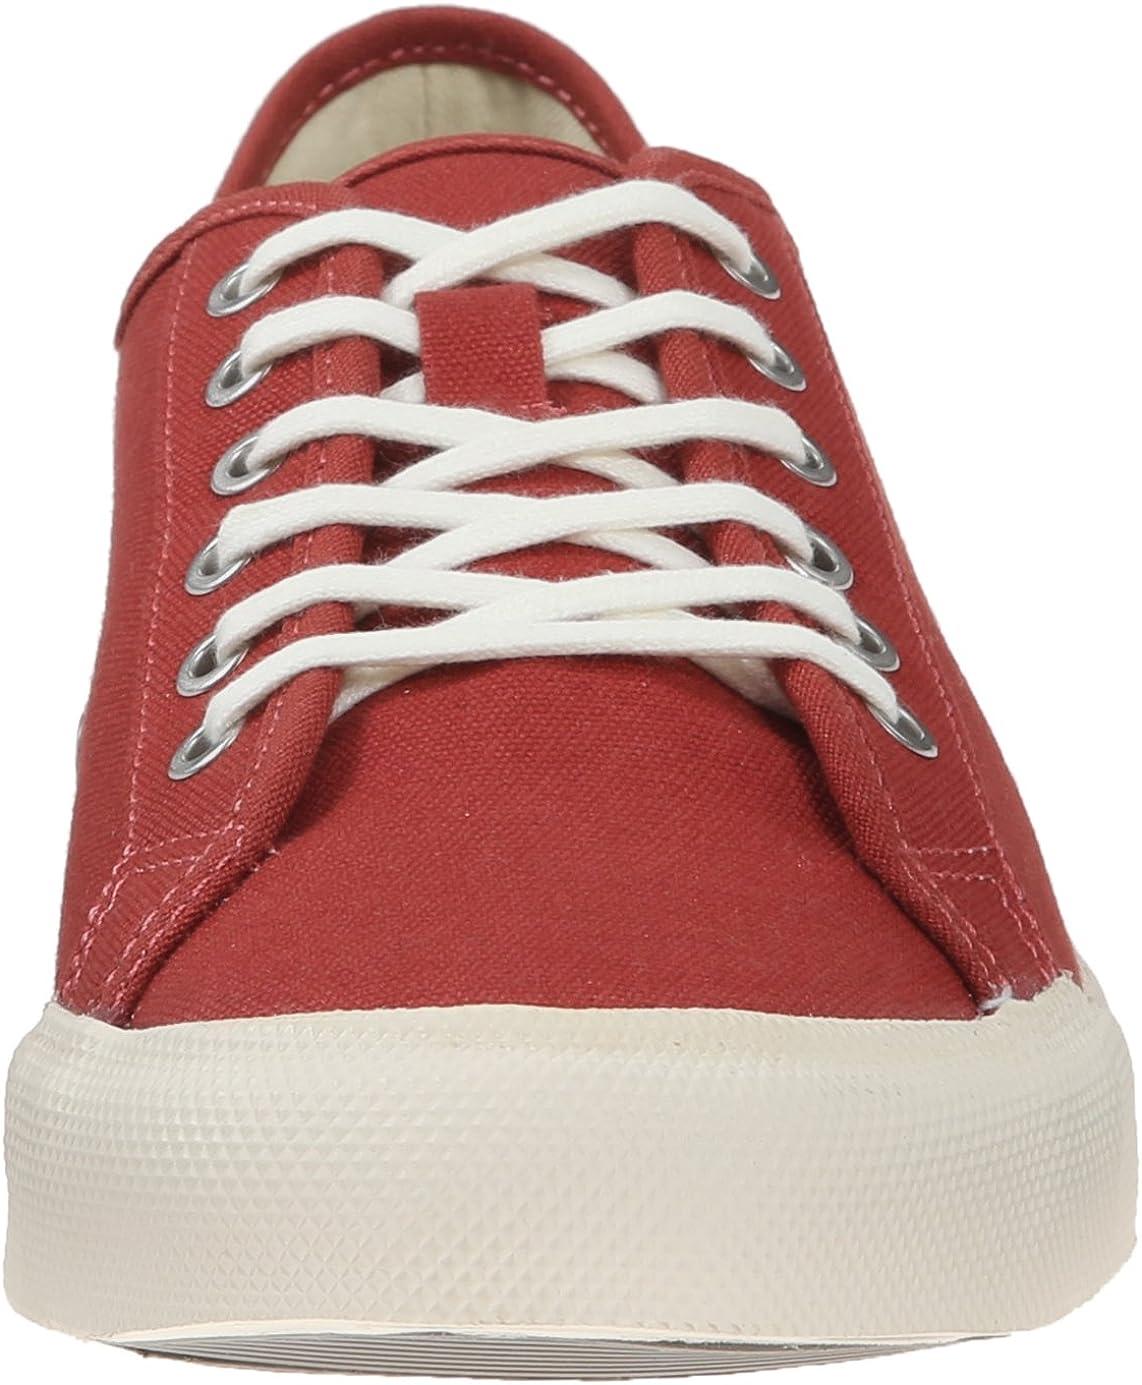 SeaVees Women's Monterey Sneakers Red Ochre